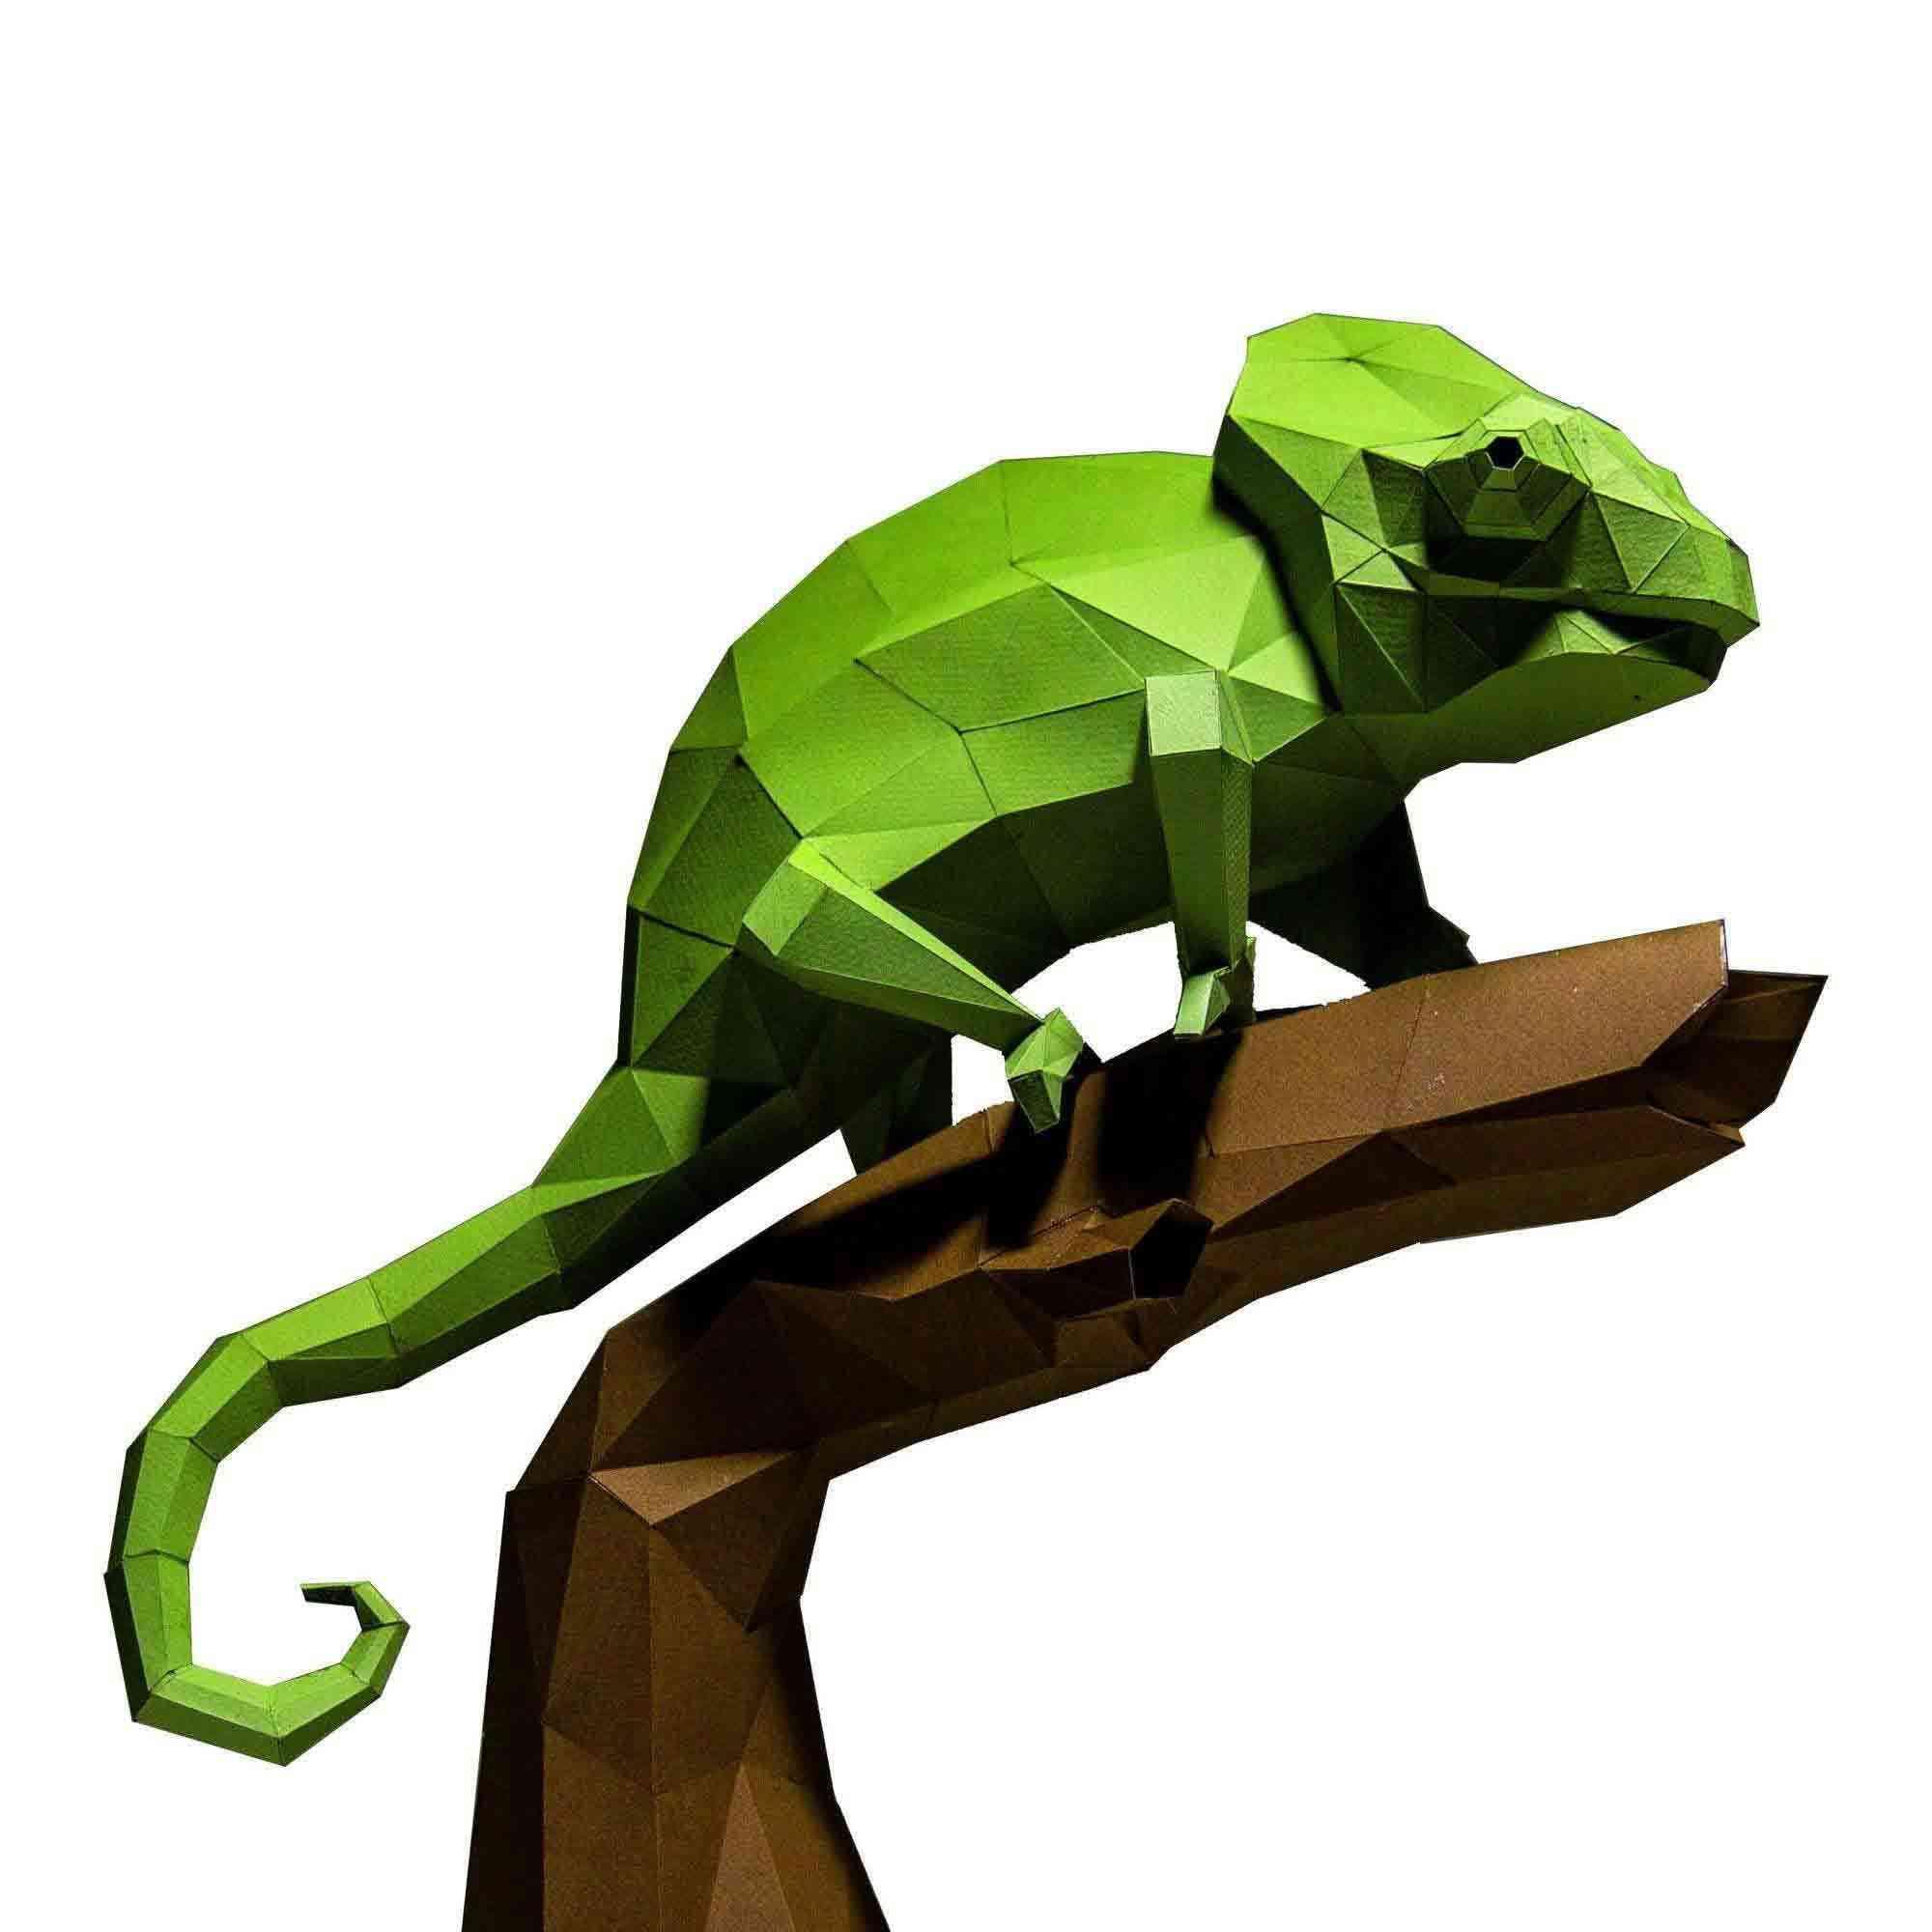 3d Pre Cut And Folded Chameleon Model Paper Craft